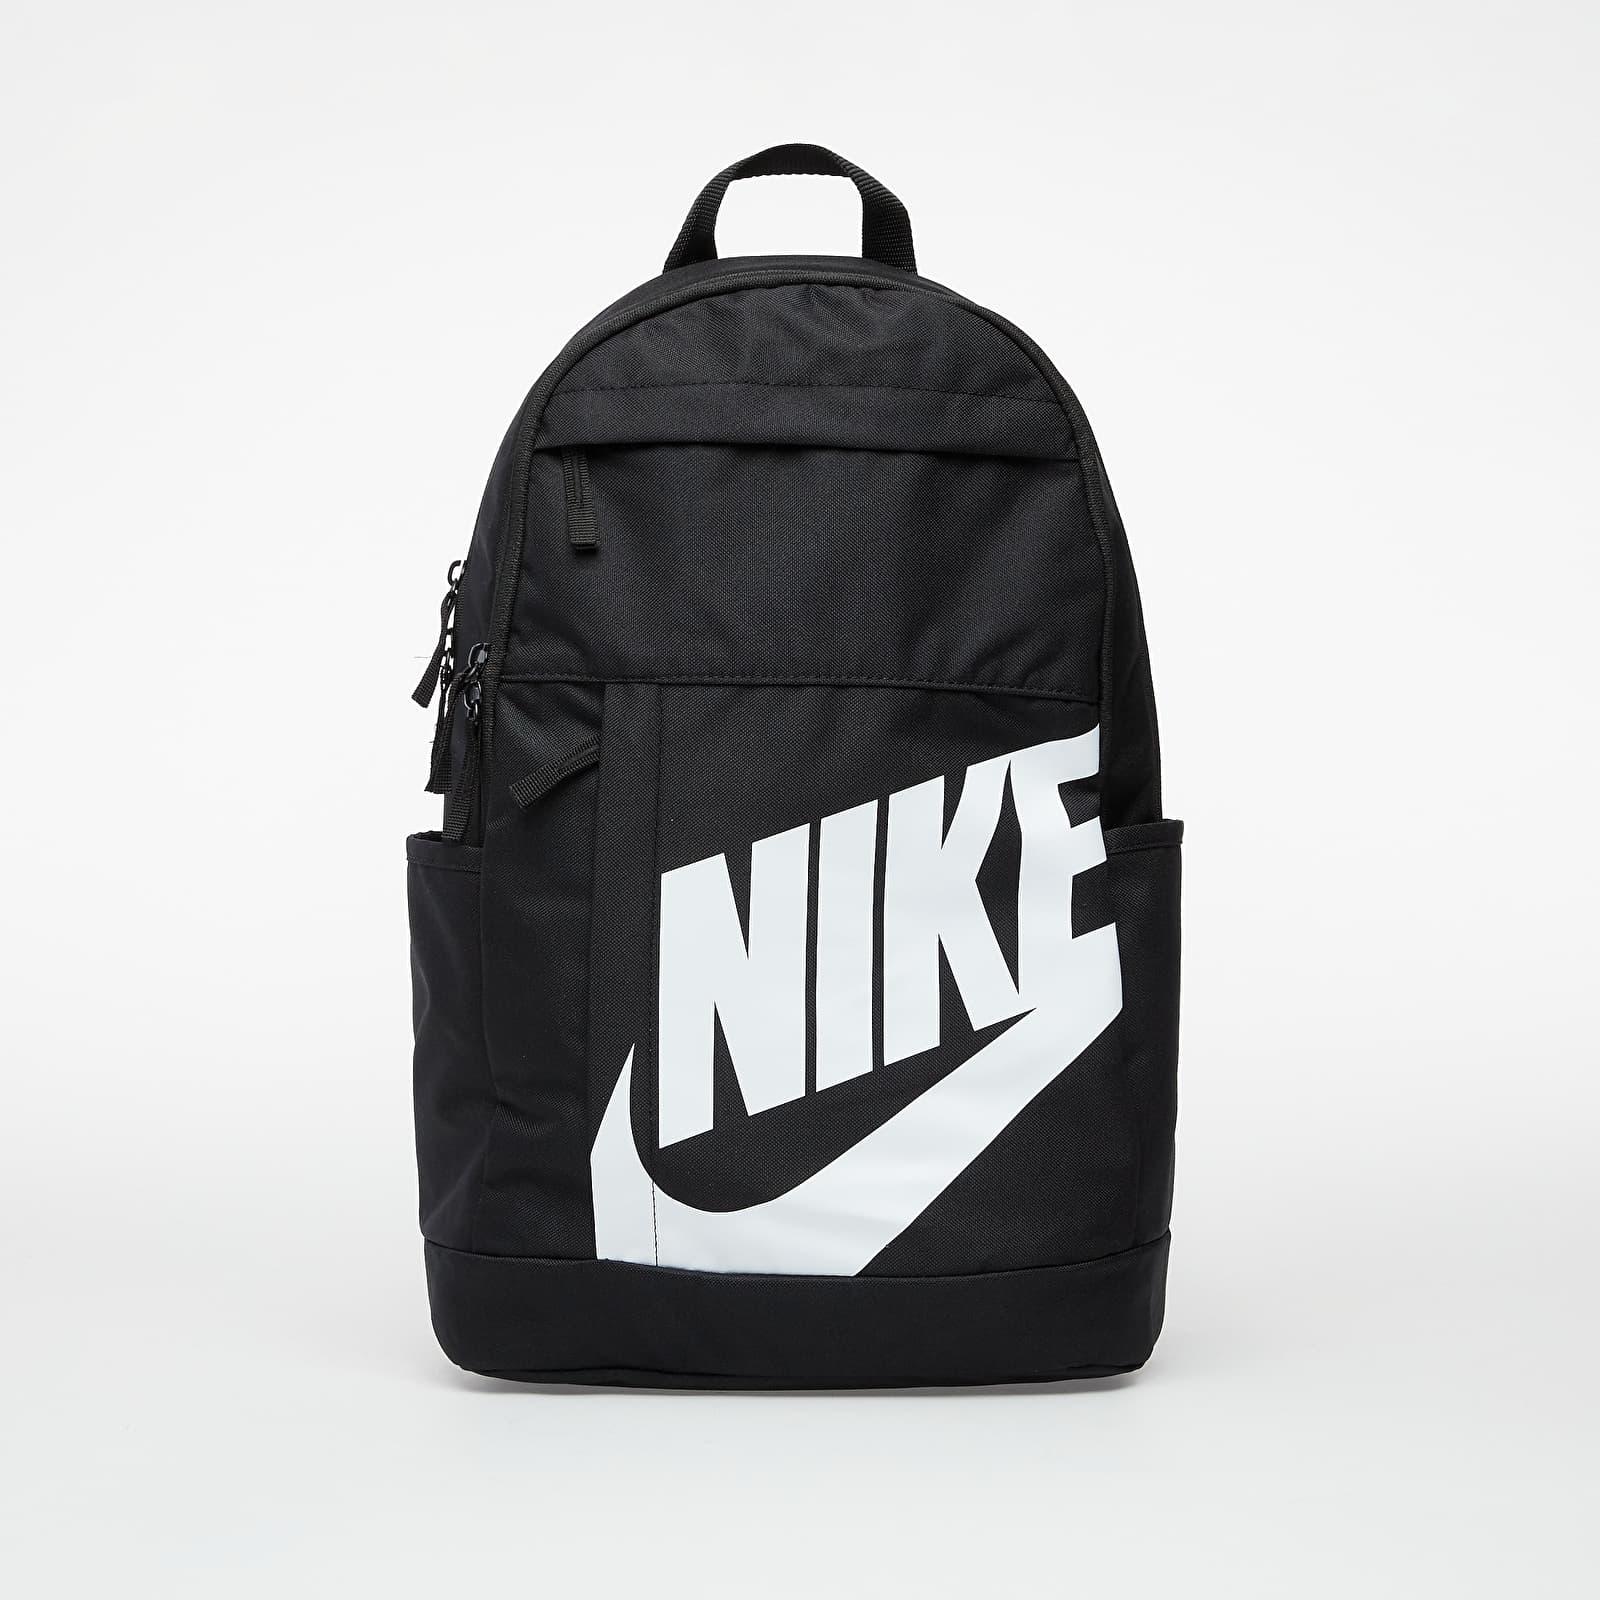 Nike Elemental Backpack Black/ Black/ White 21 litrov